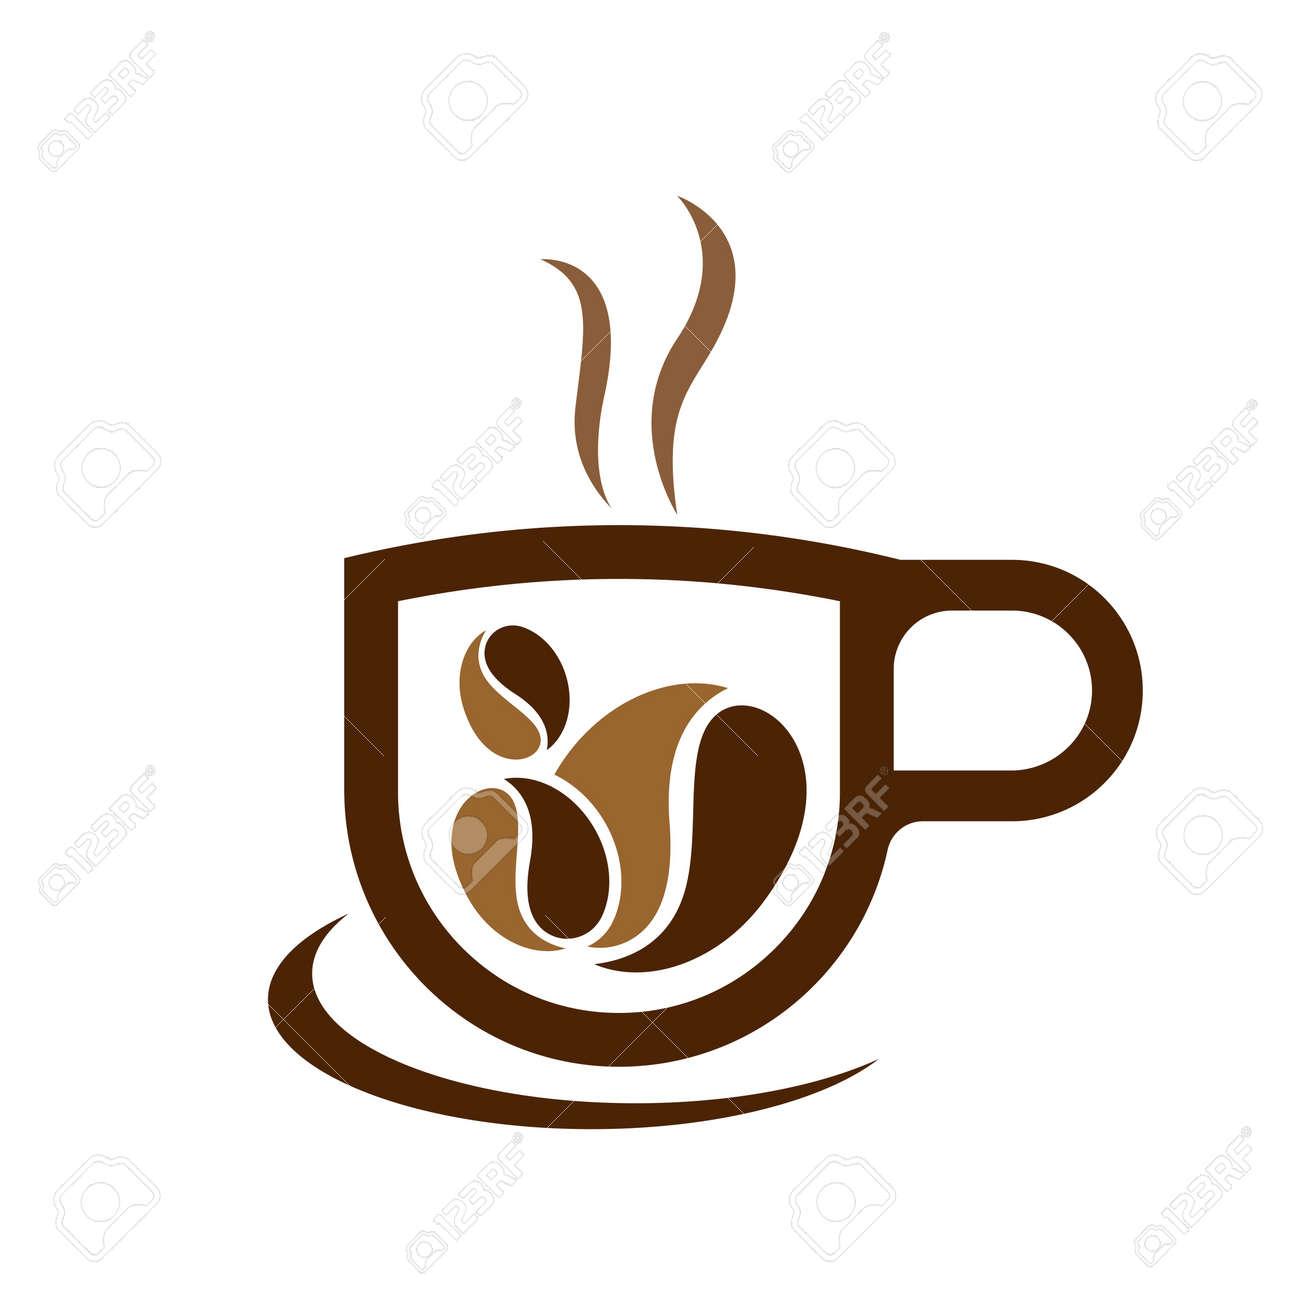 Coffee cup logo images illustration design - 167448836